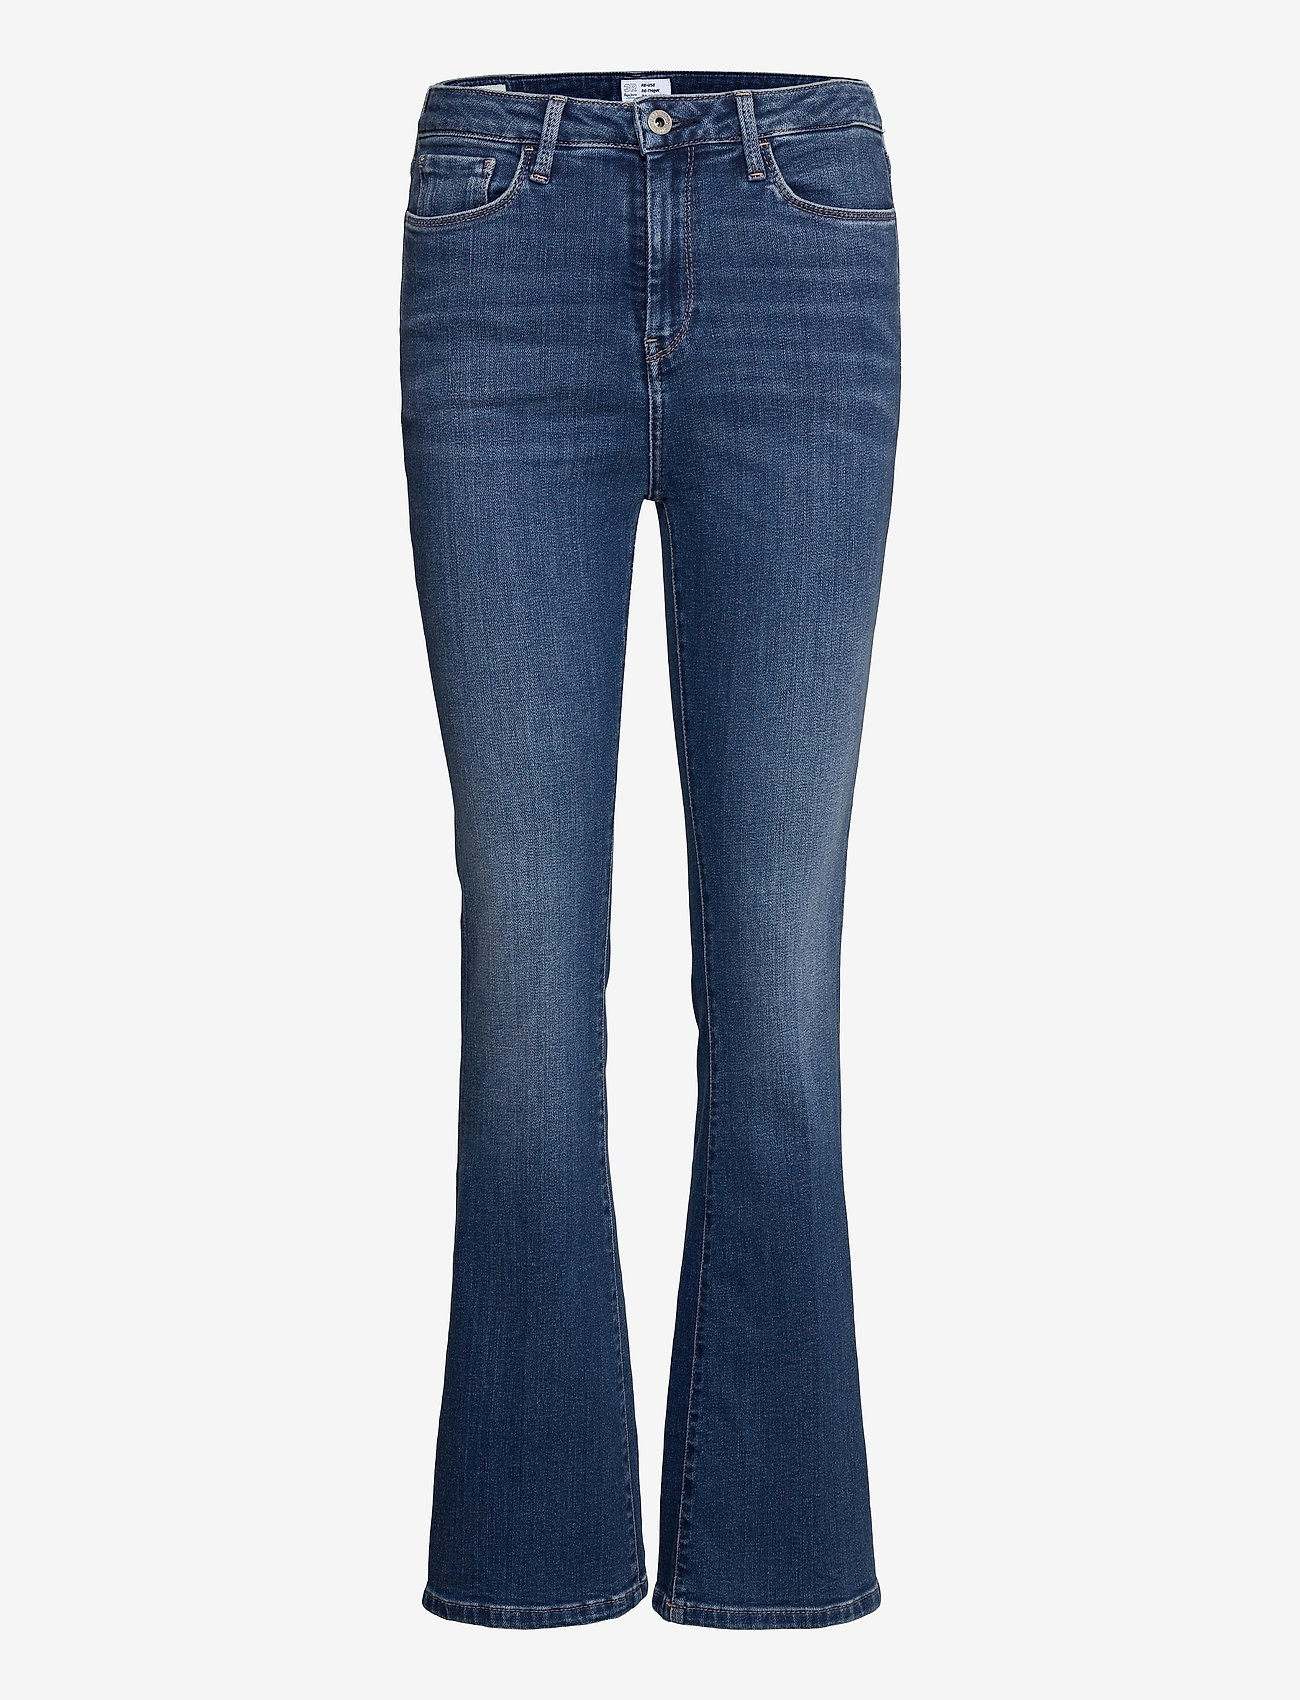 Pepe Jeans London - DION FLARE - schlaghosen - denim - 0